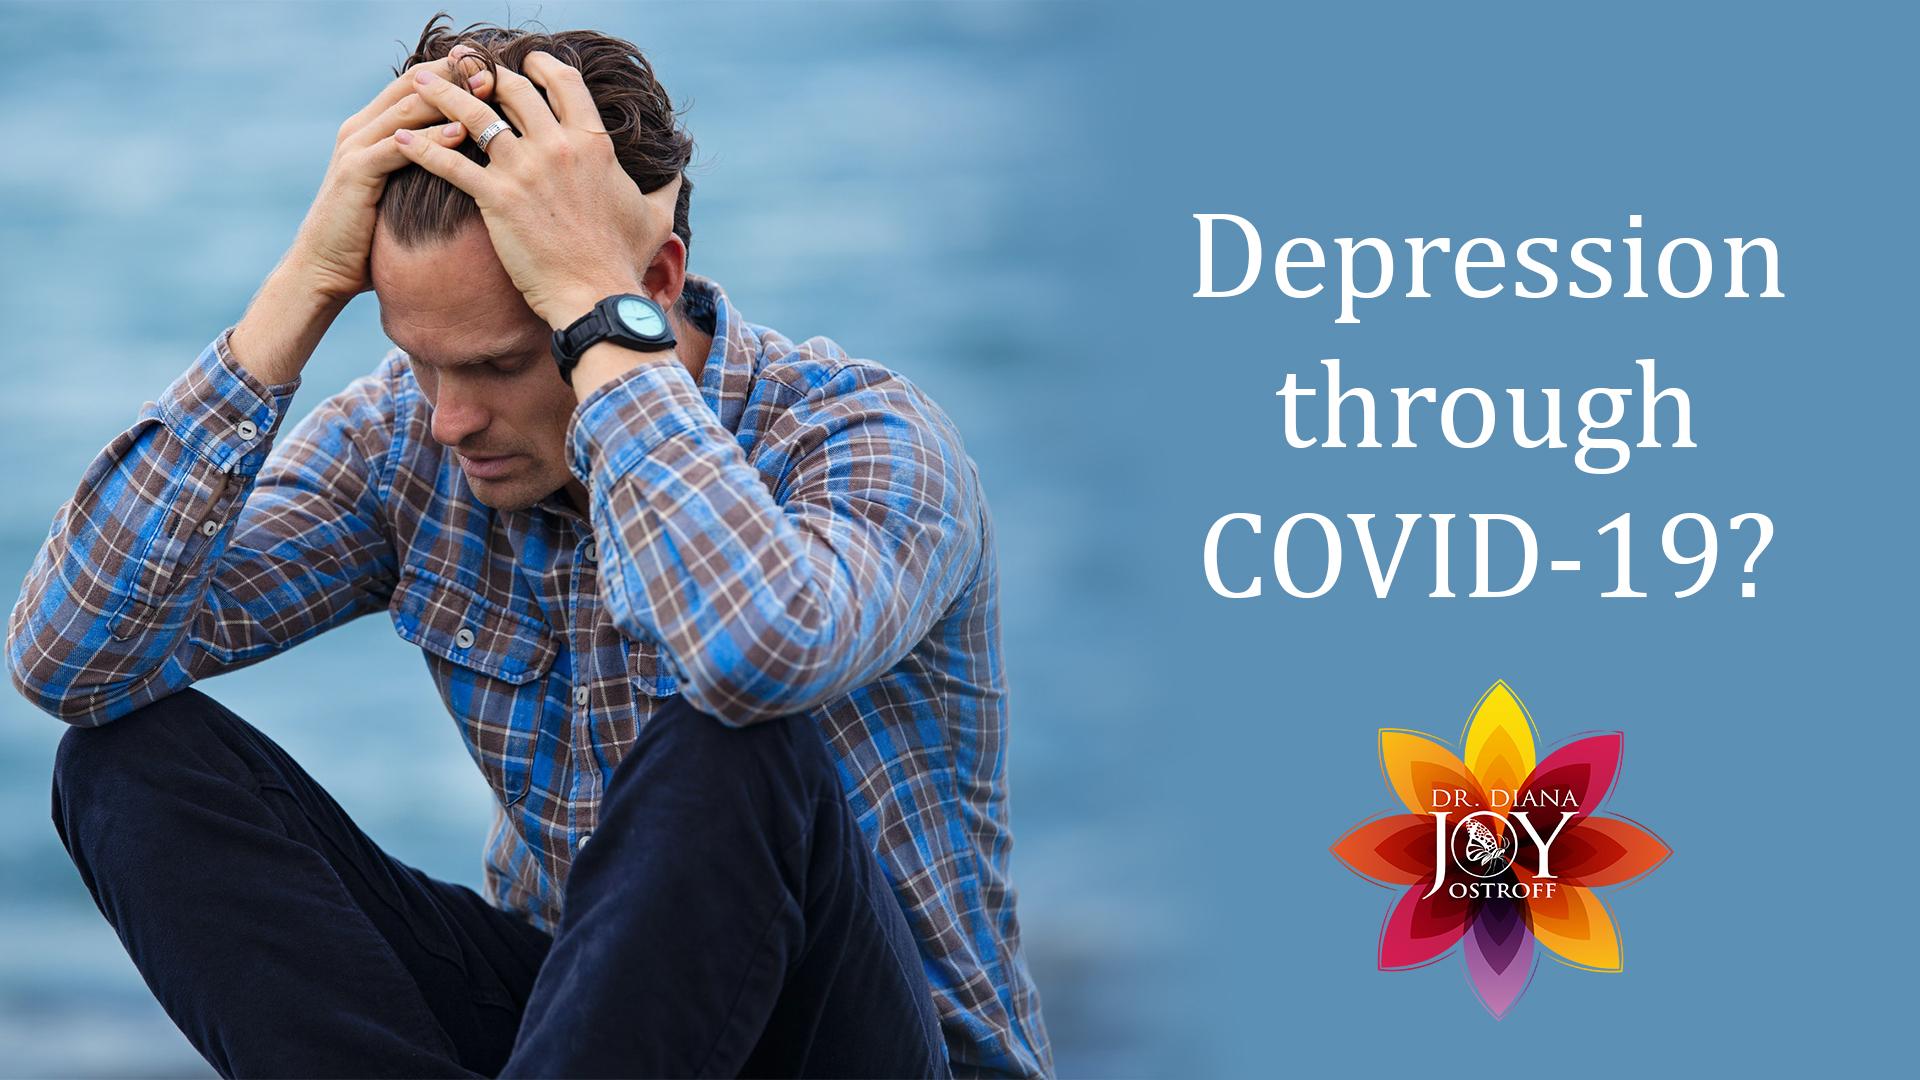 Depression through COVID-19?